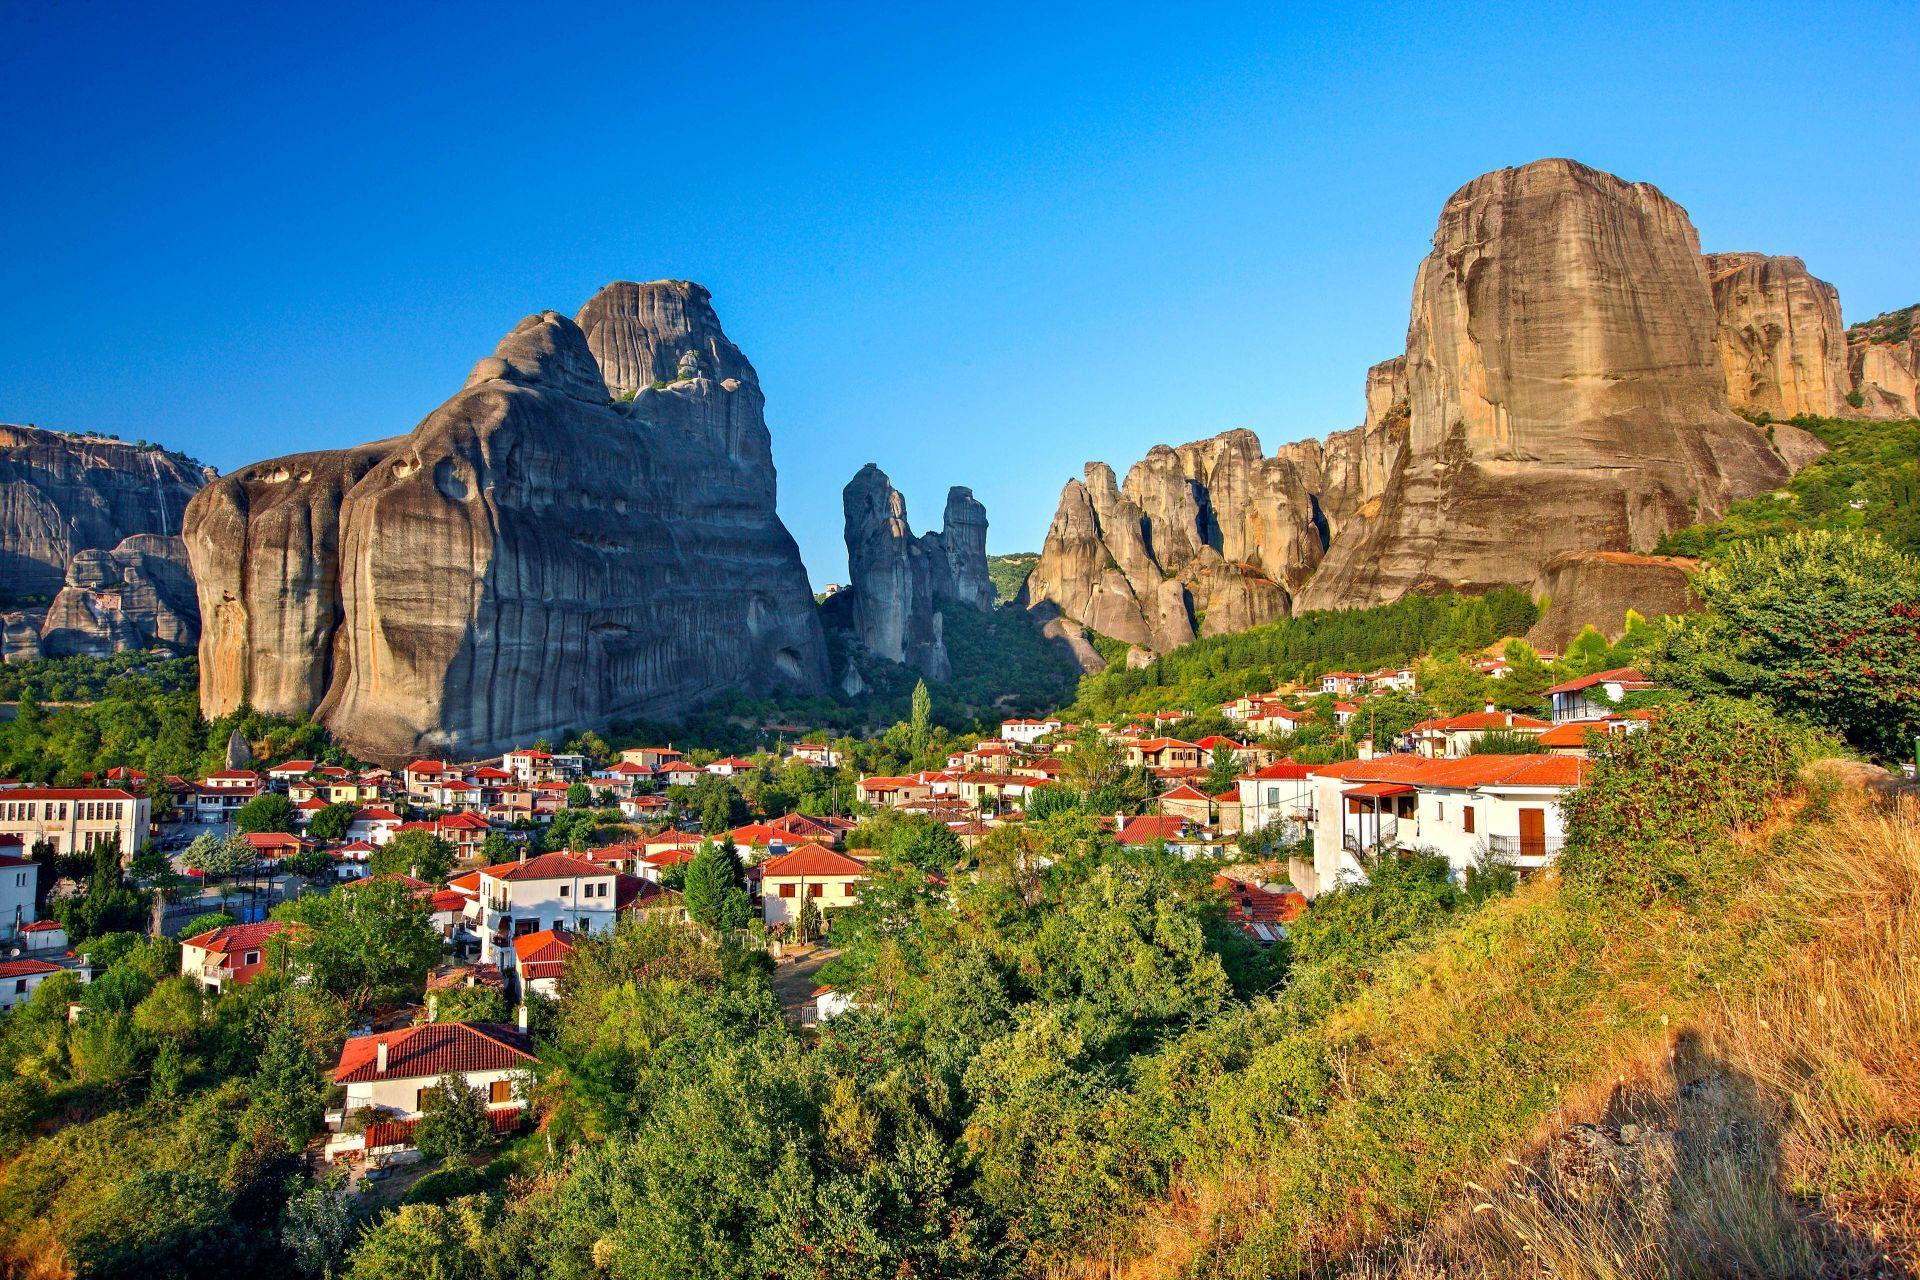 Meteora: Kastraki rock formations